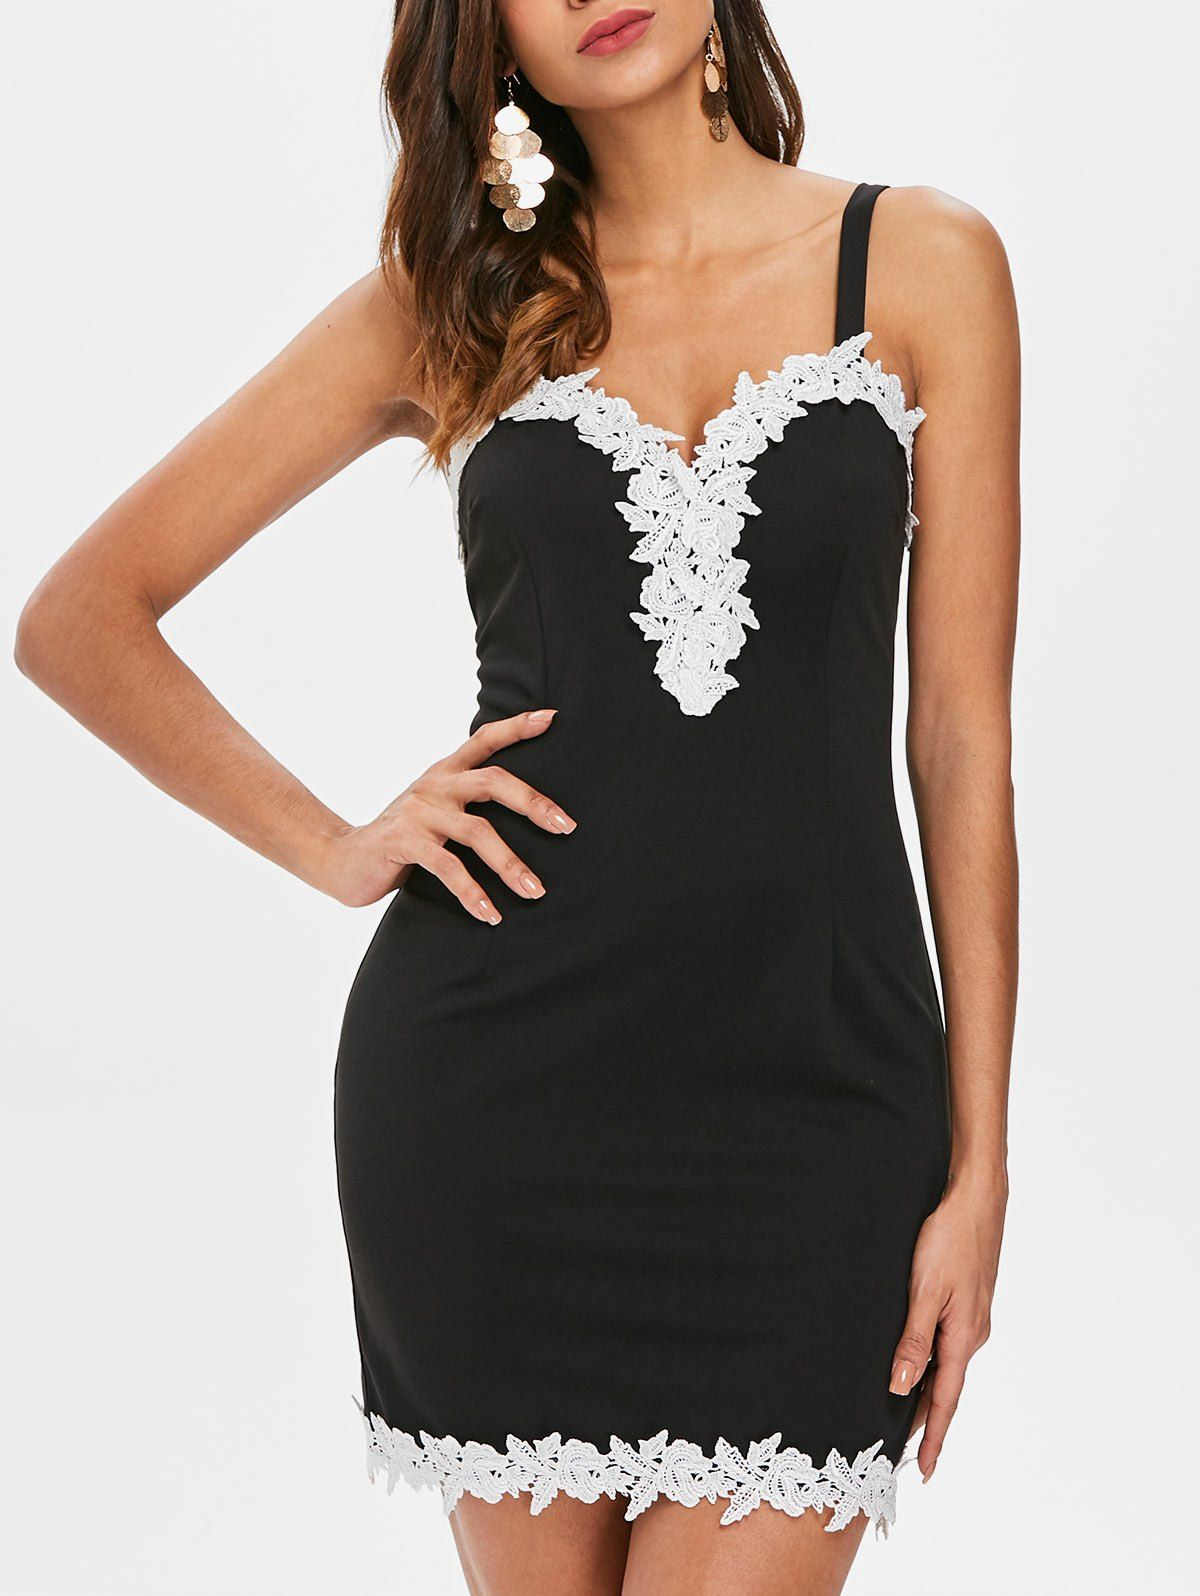 6da4708d893 Open Back Lace Color Block Dress in Black  dress  dresses  fashion ...